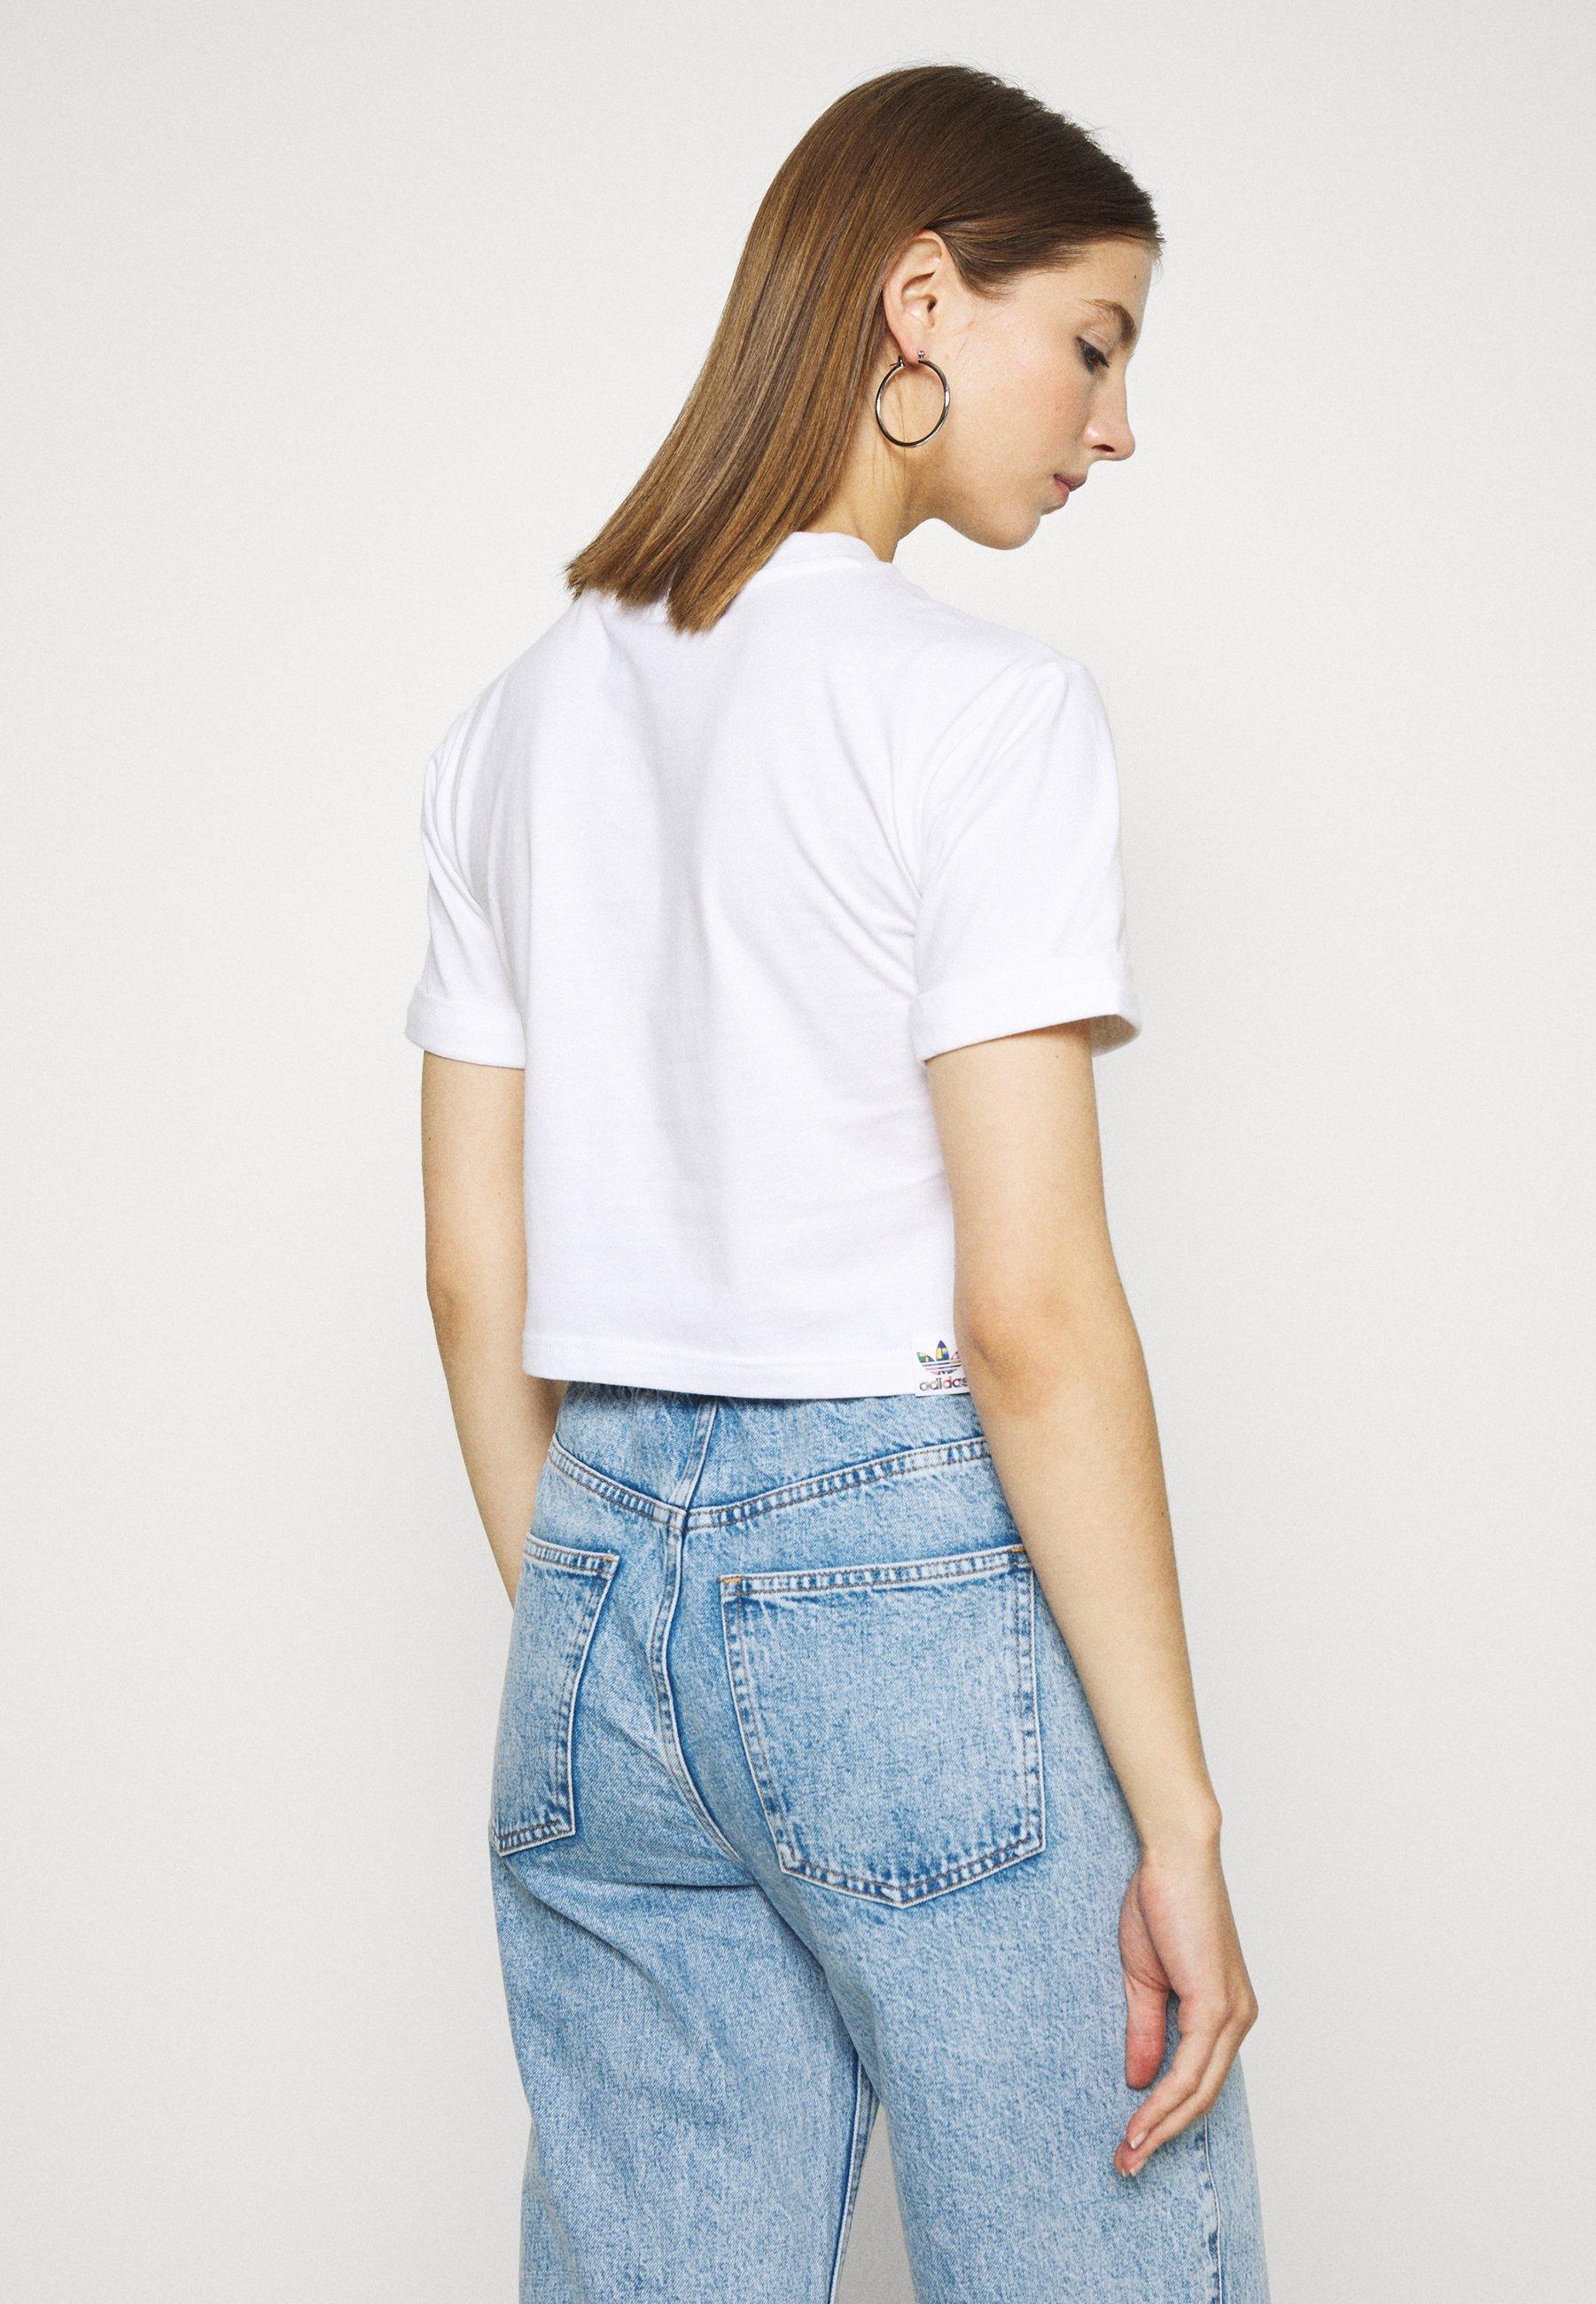 Adidas Originals Pride Short Sleeve Graphic Tee - T-shirts Med Print White/hvit